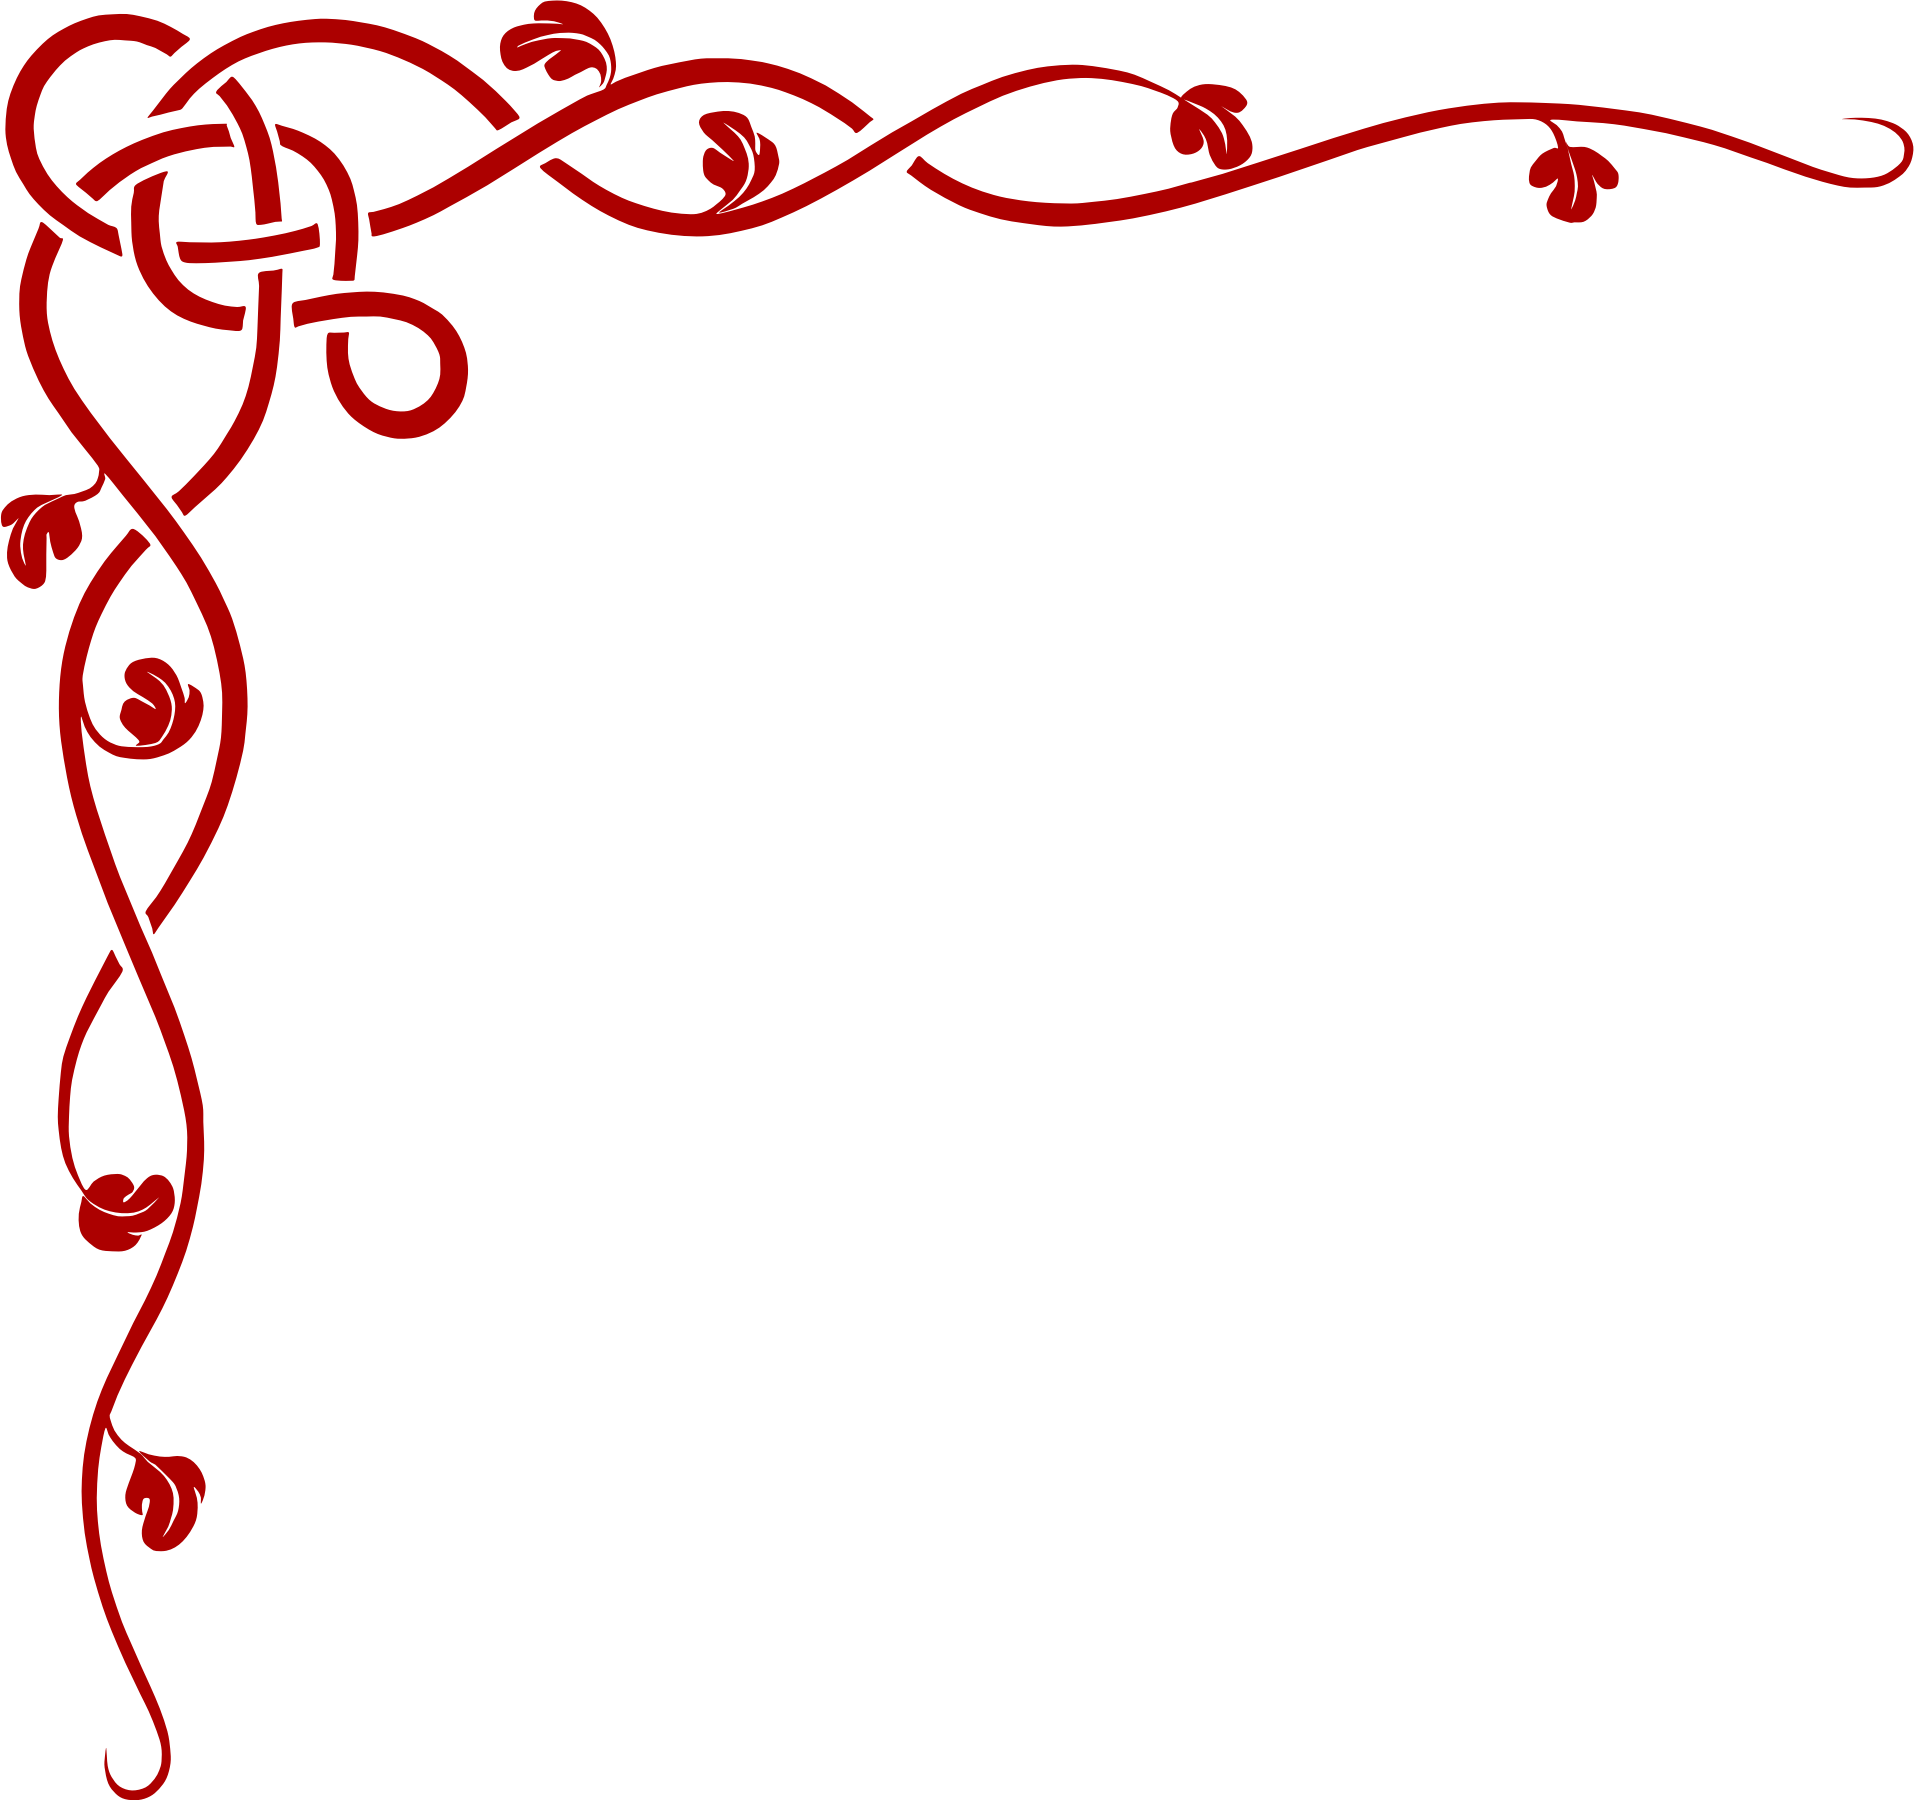 Clipart borders red. Knot corner border big